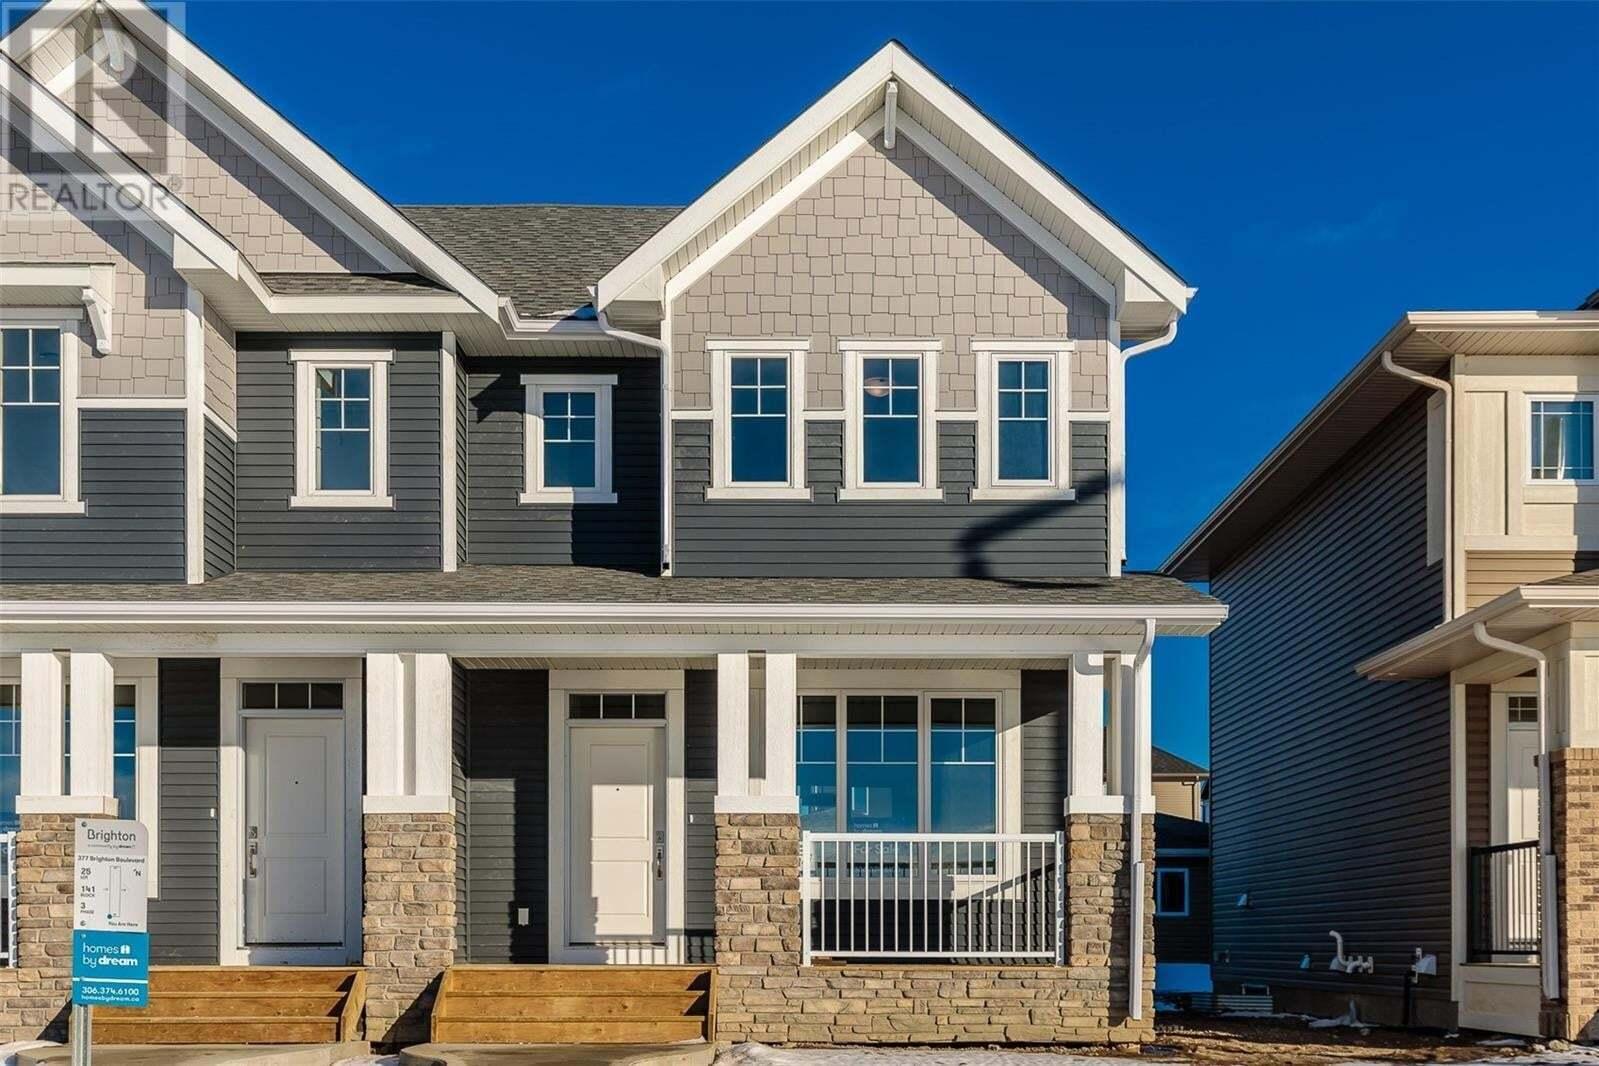 House for sale at 361 Brighton Blvd Saskatoon Saskatchewan - MLS: SK825754